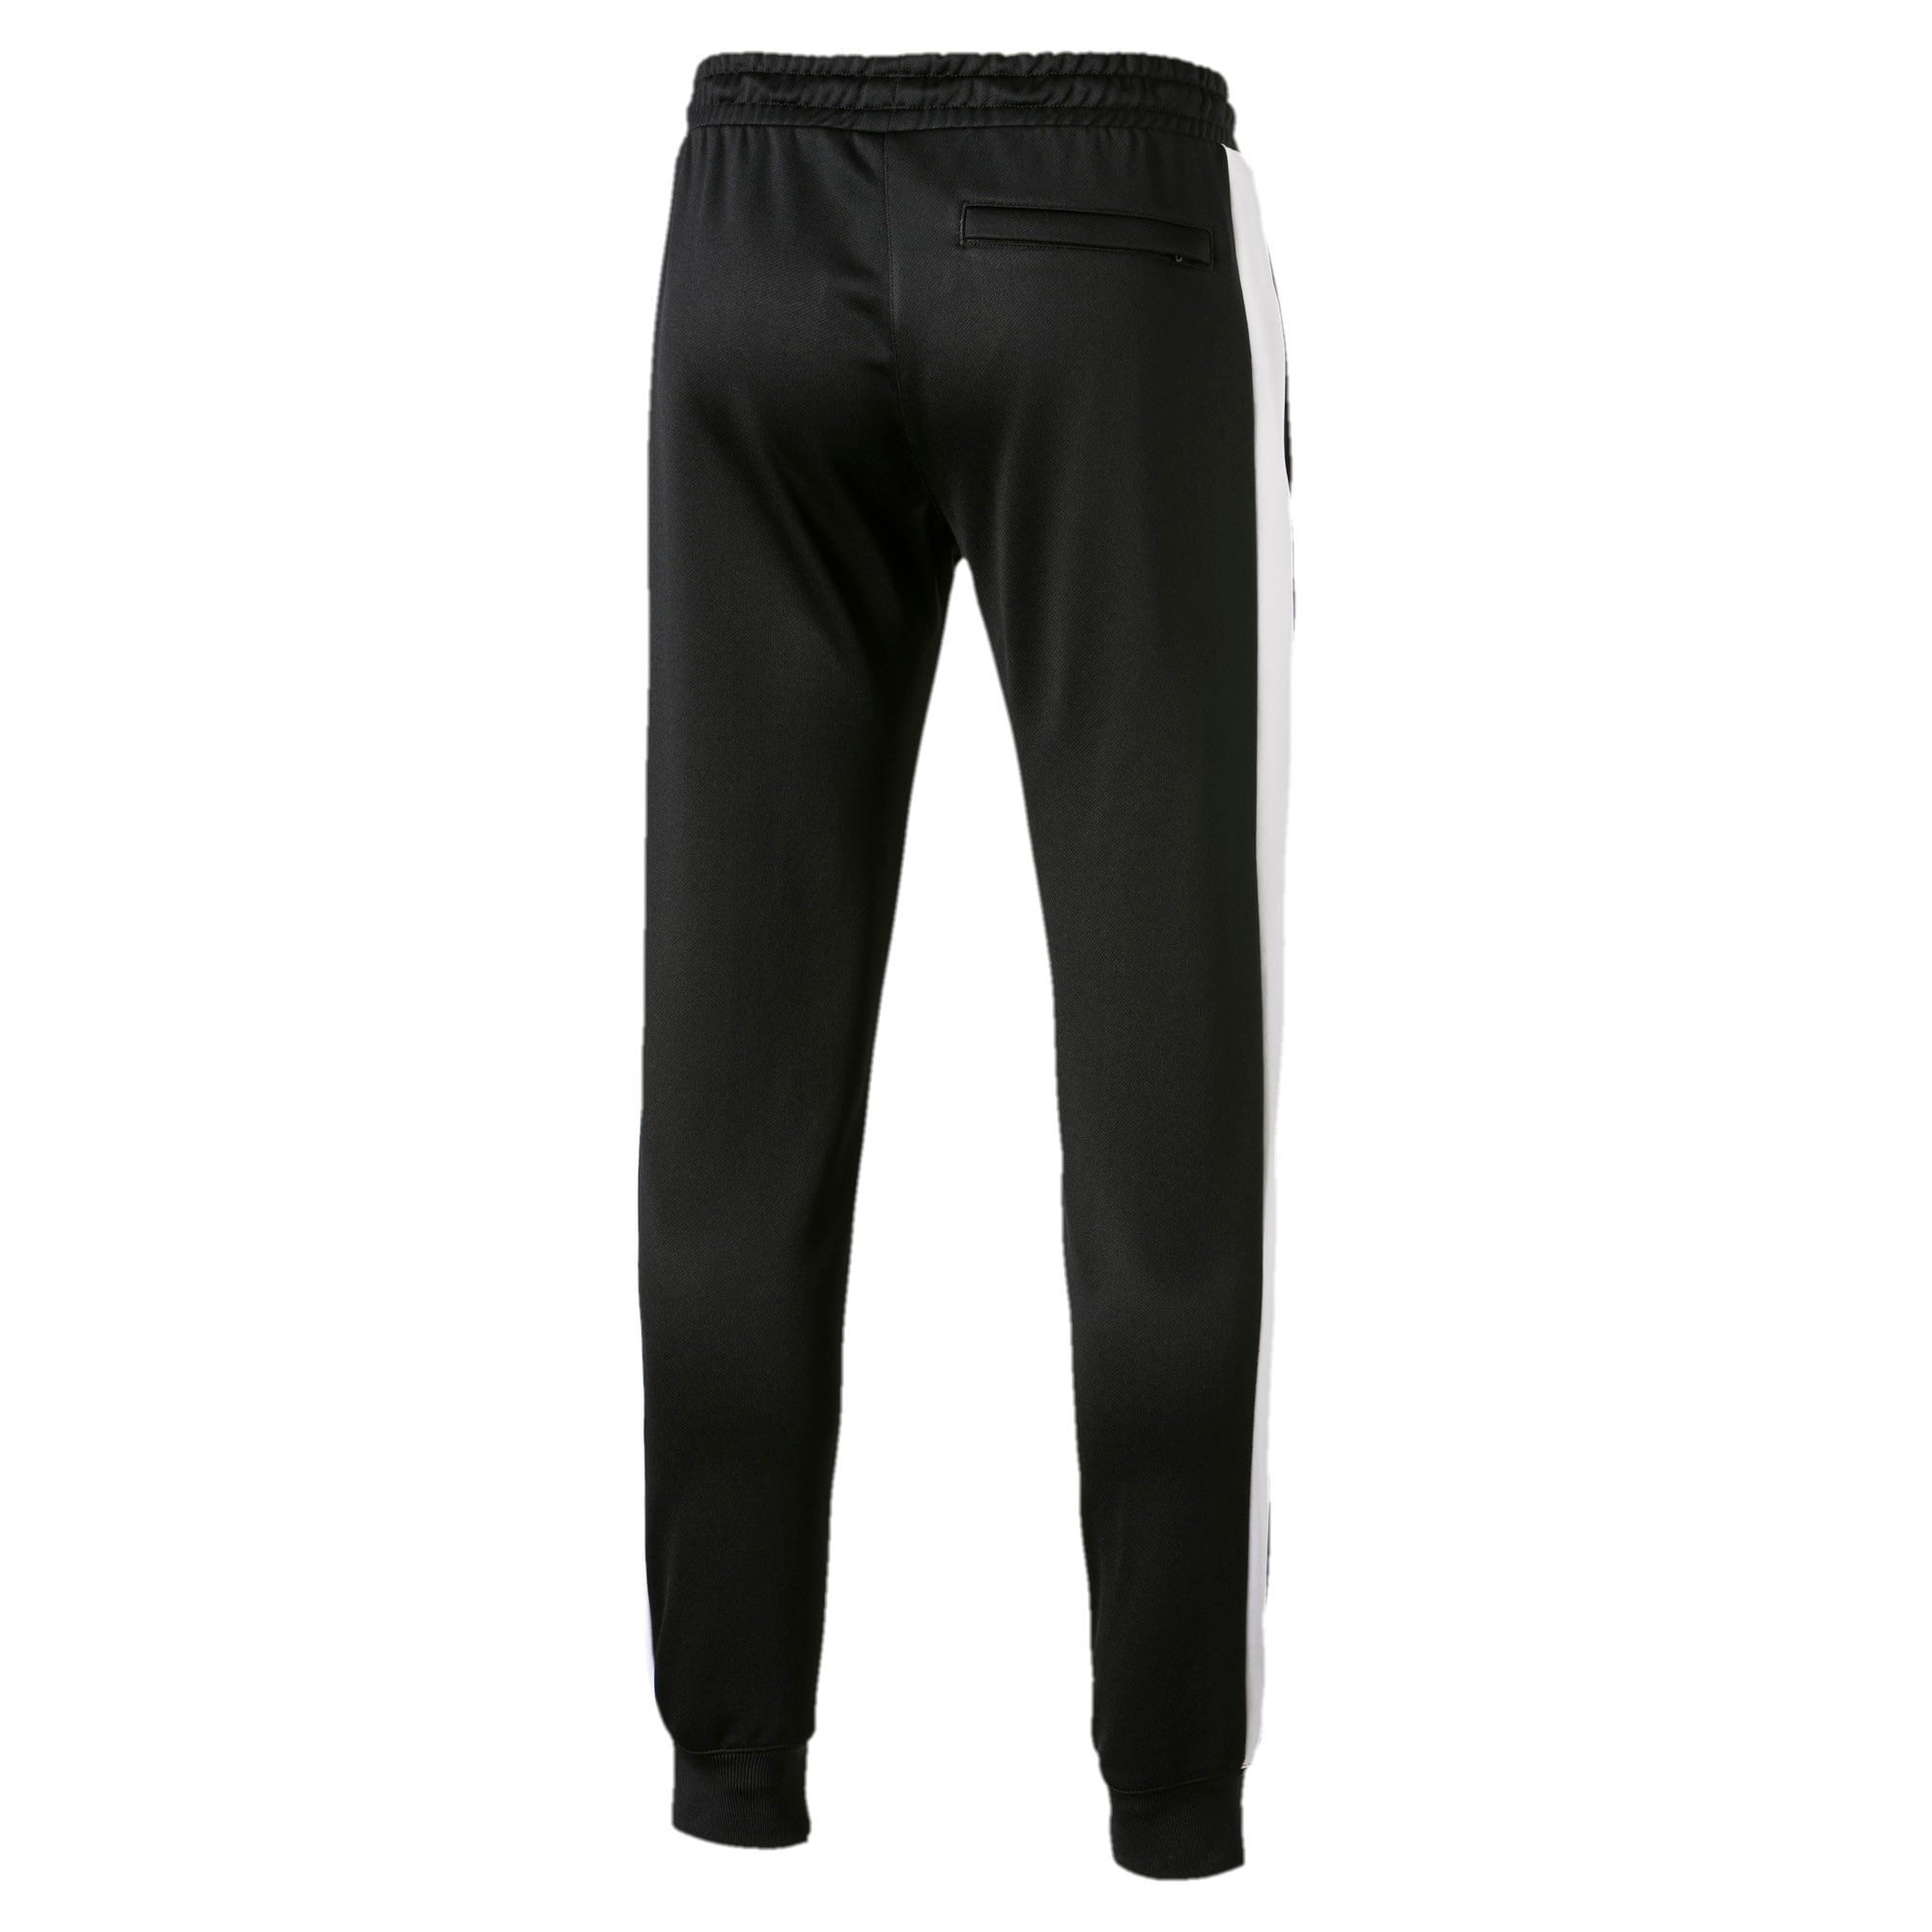 Thumbnail 5 of Iconic T7 Kntted Men's Sweatpants, Puma Black, medium-IND